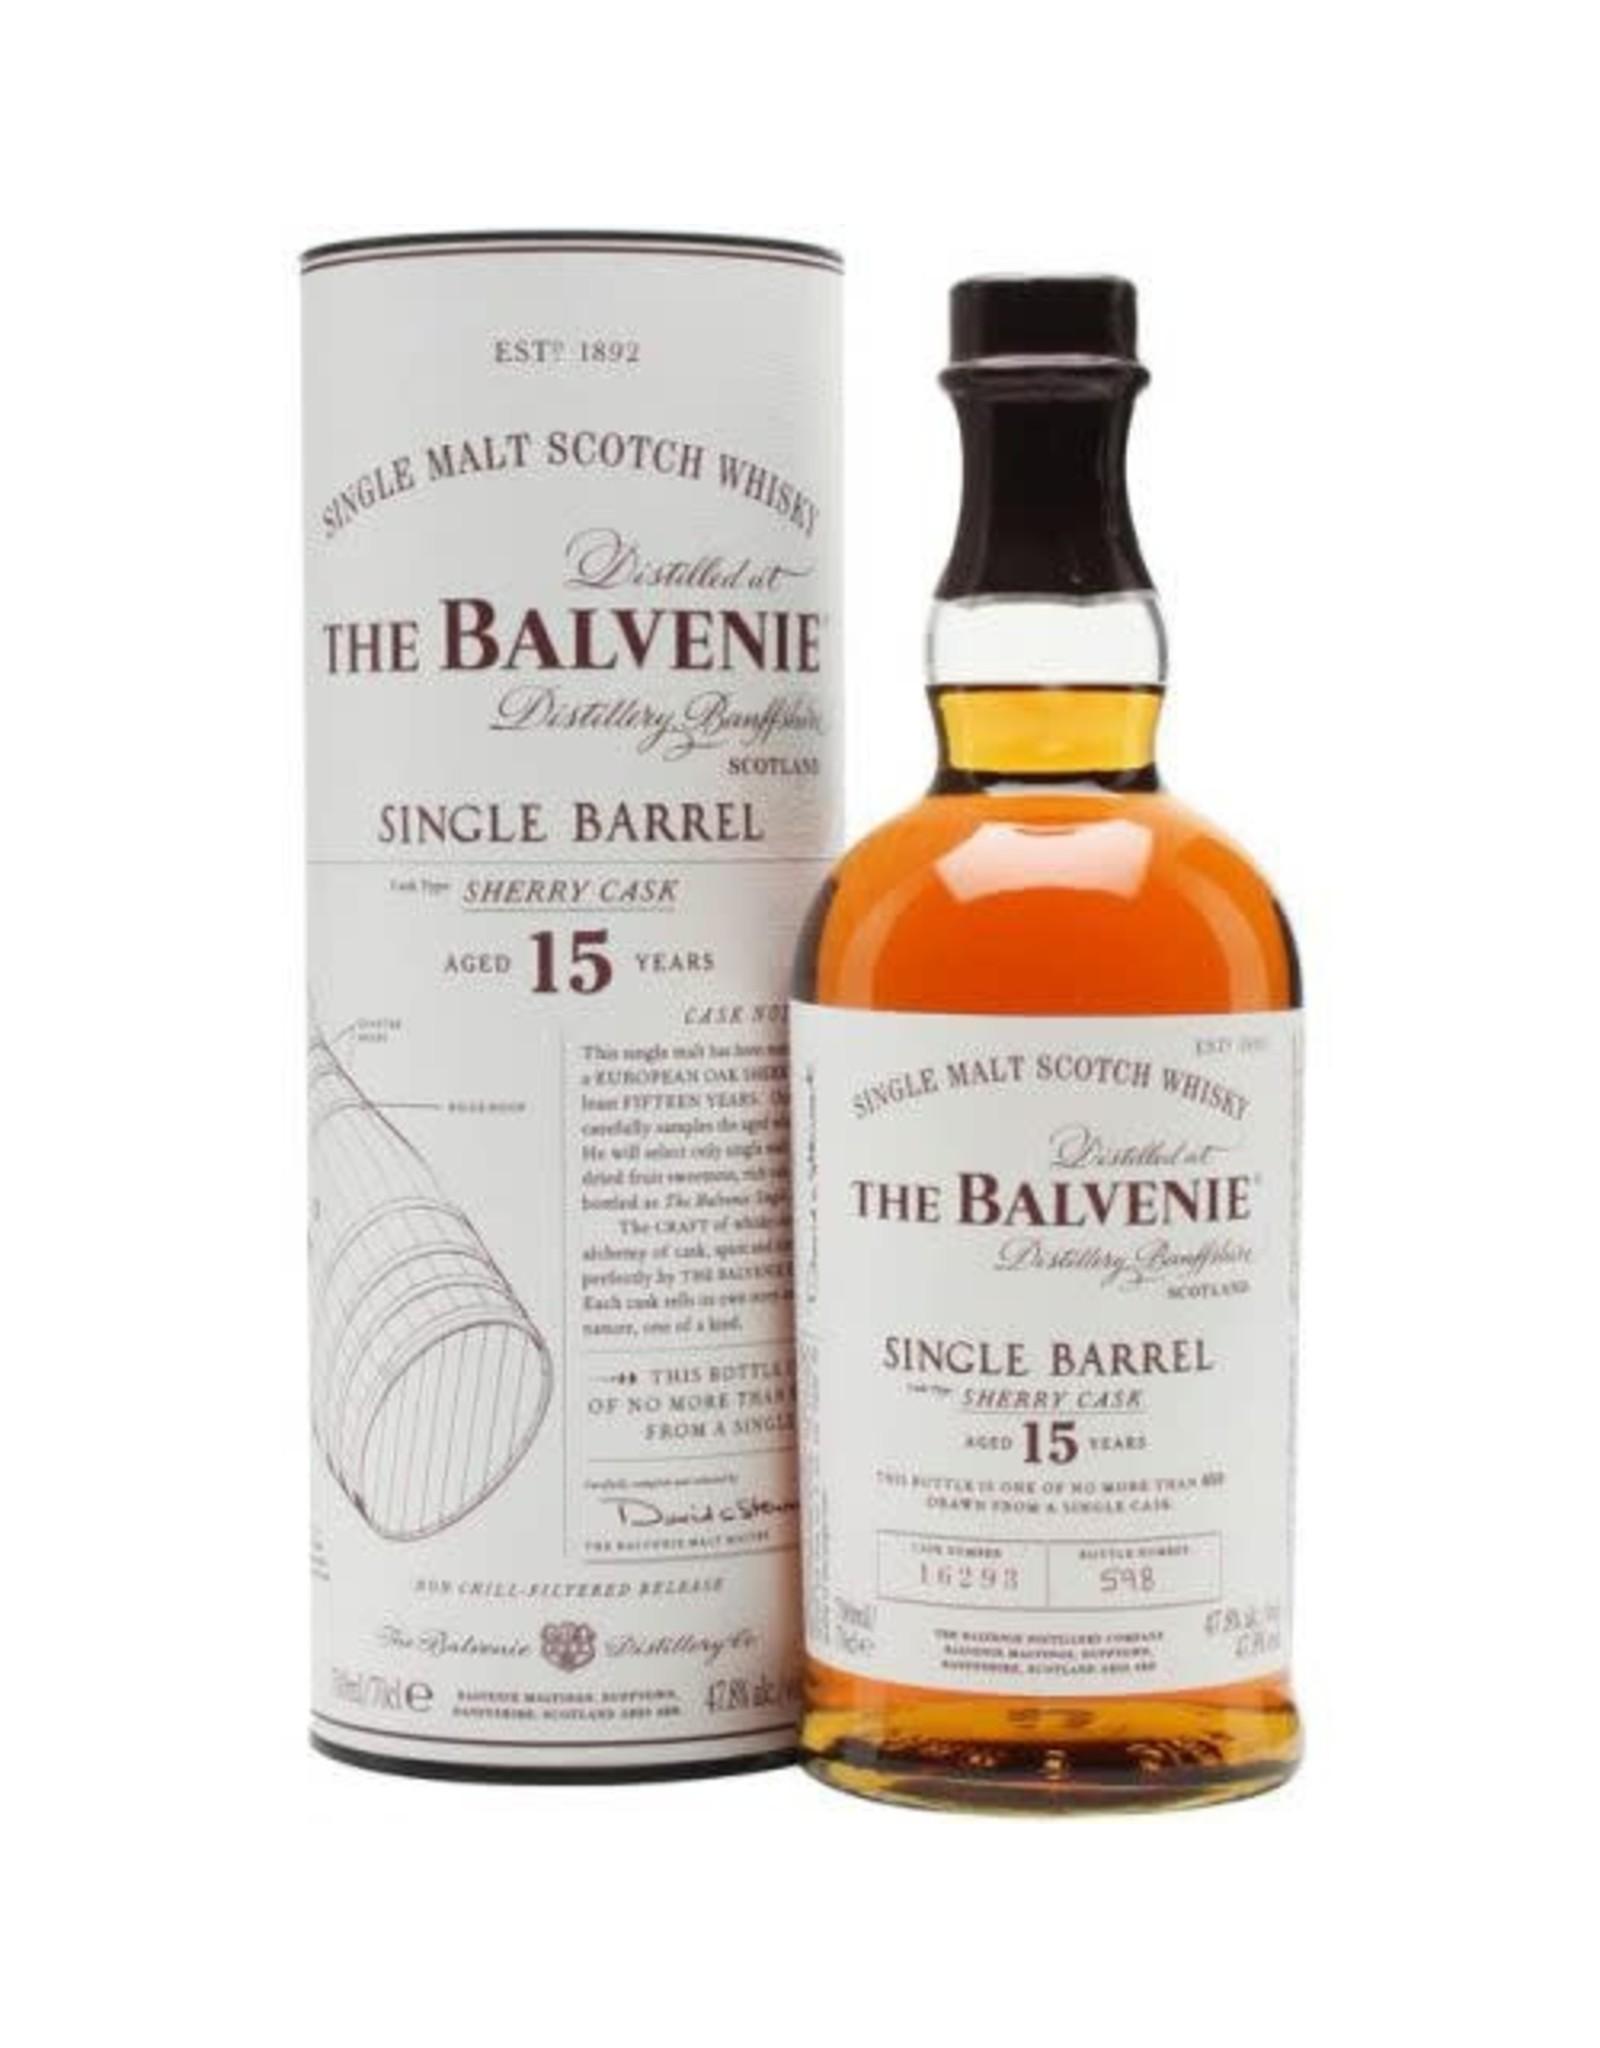 Balvenie Single Barrel 15 Sherry cask